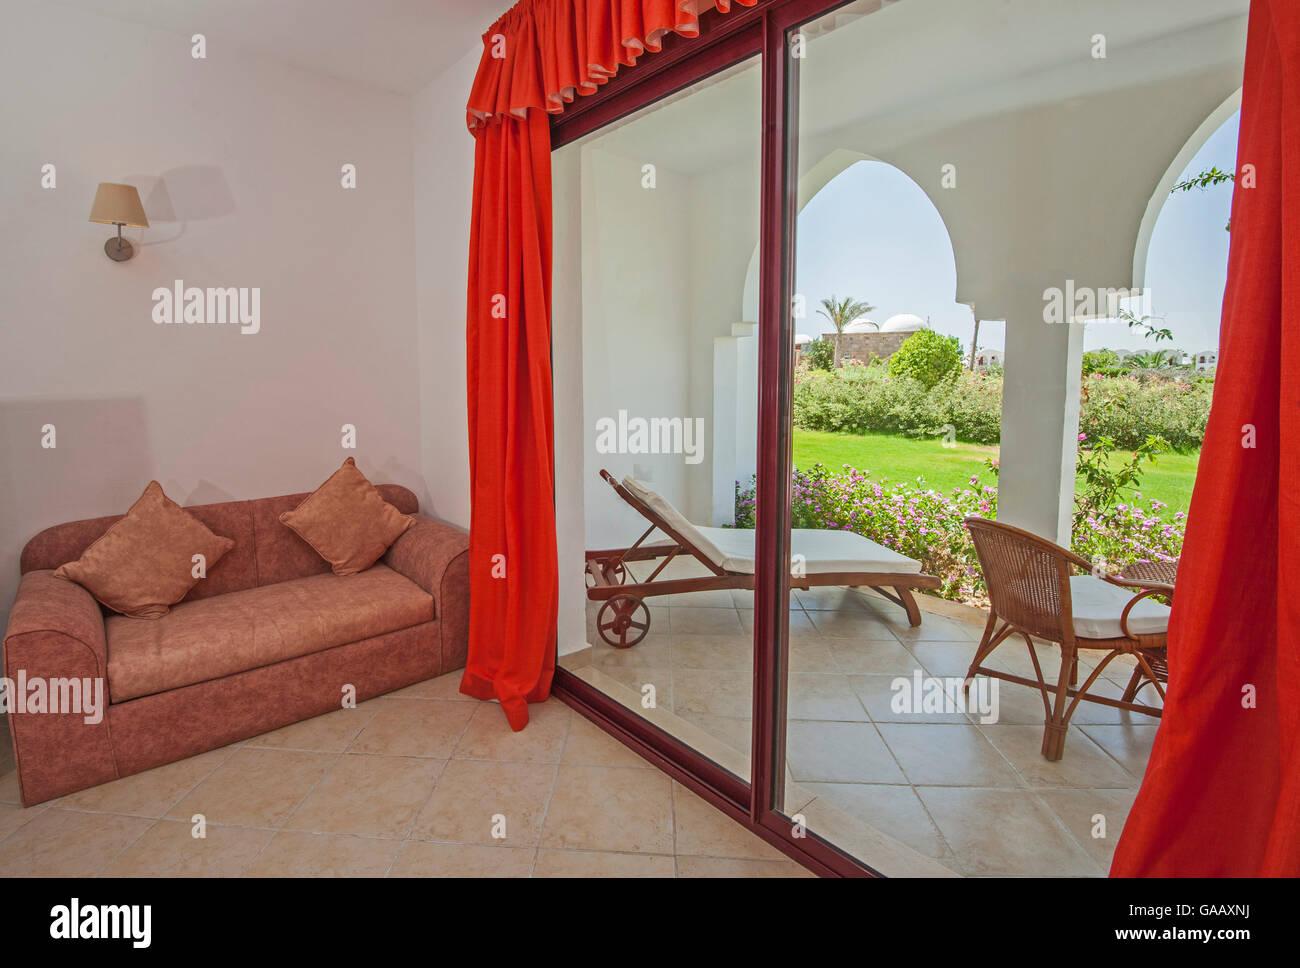 interior design of a luxury tropical hotel resort bedroom with balcony patio area